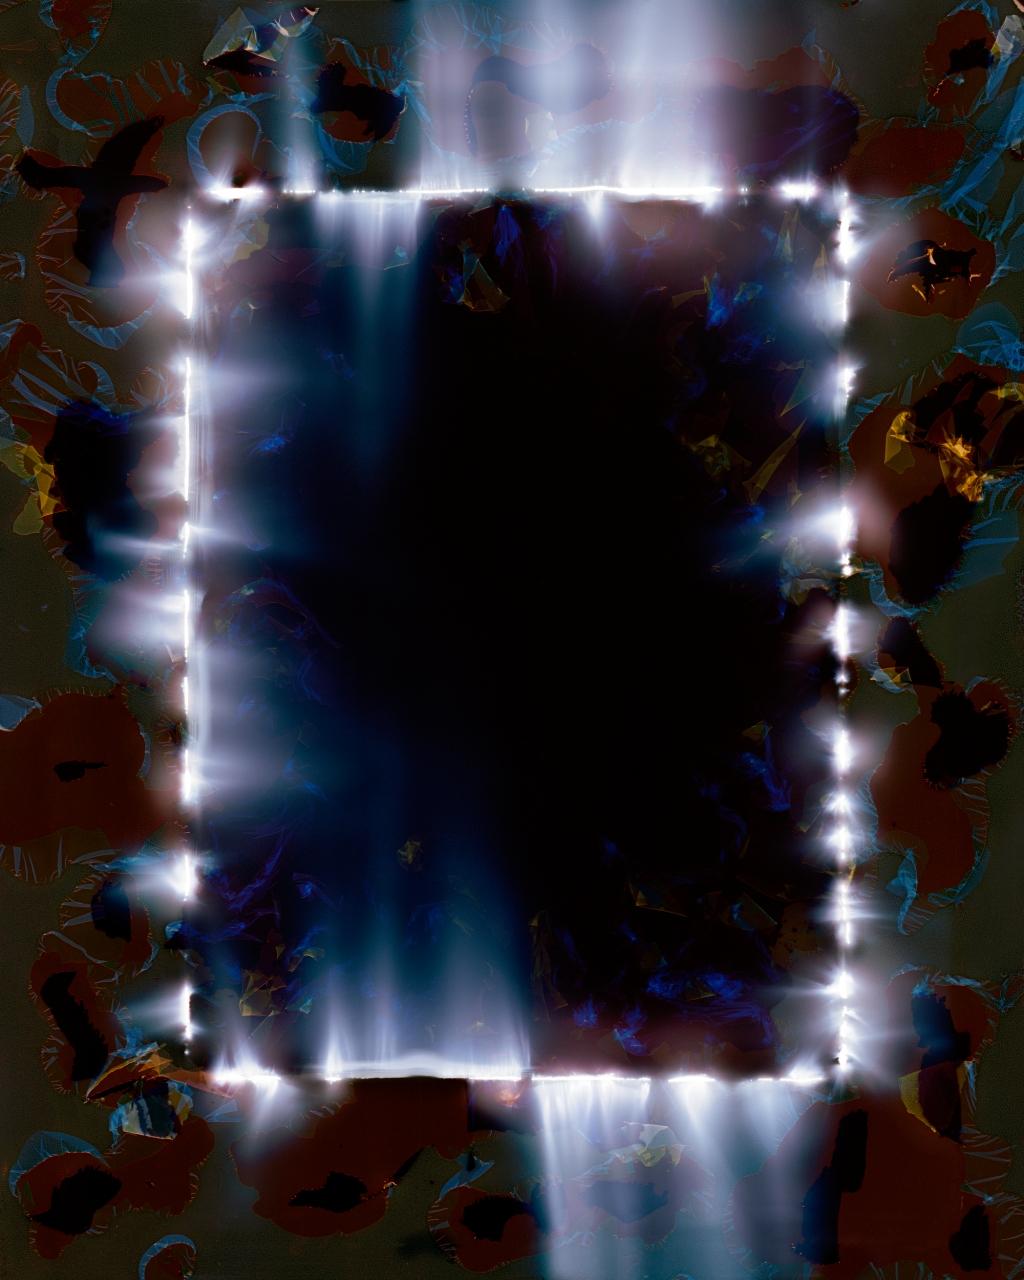 Isabel M. Martinez, A Long Metaphor for Insomnia, 2018. Chromogenic print, 40 x 32. © Isabel M. Martinez. Courtesy of the artist